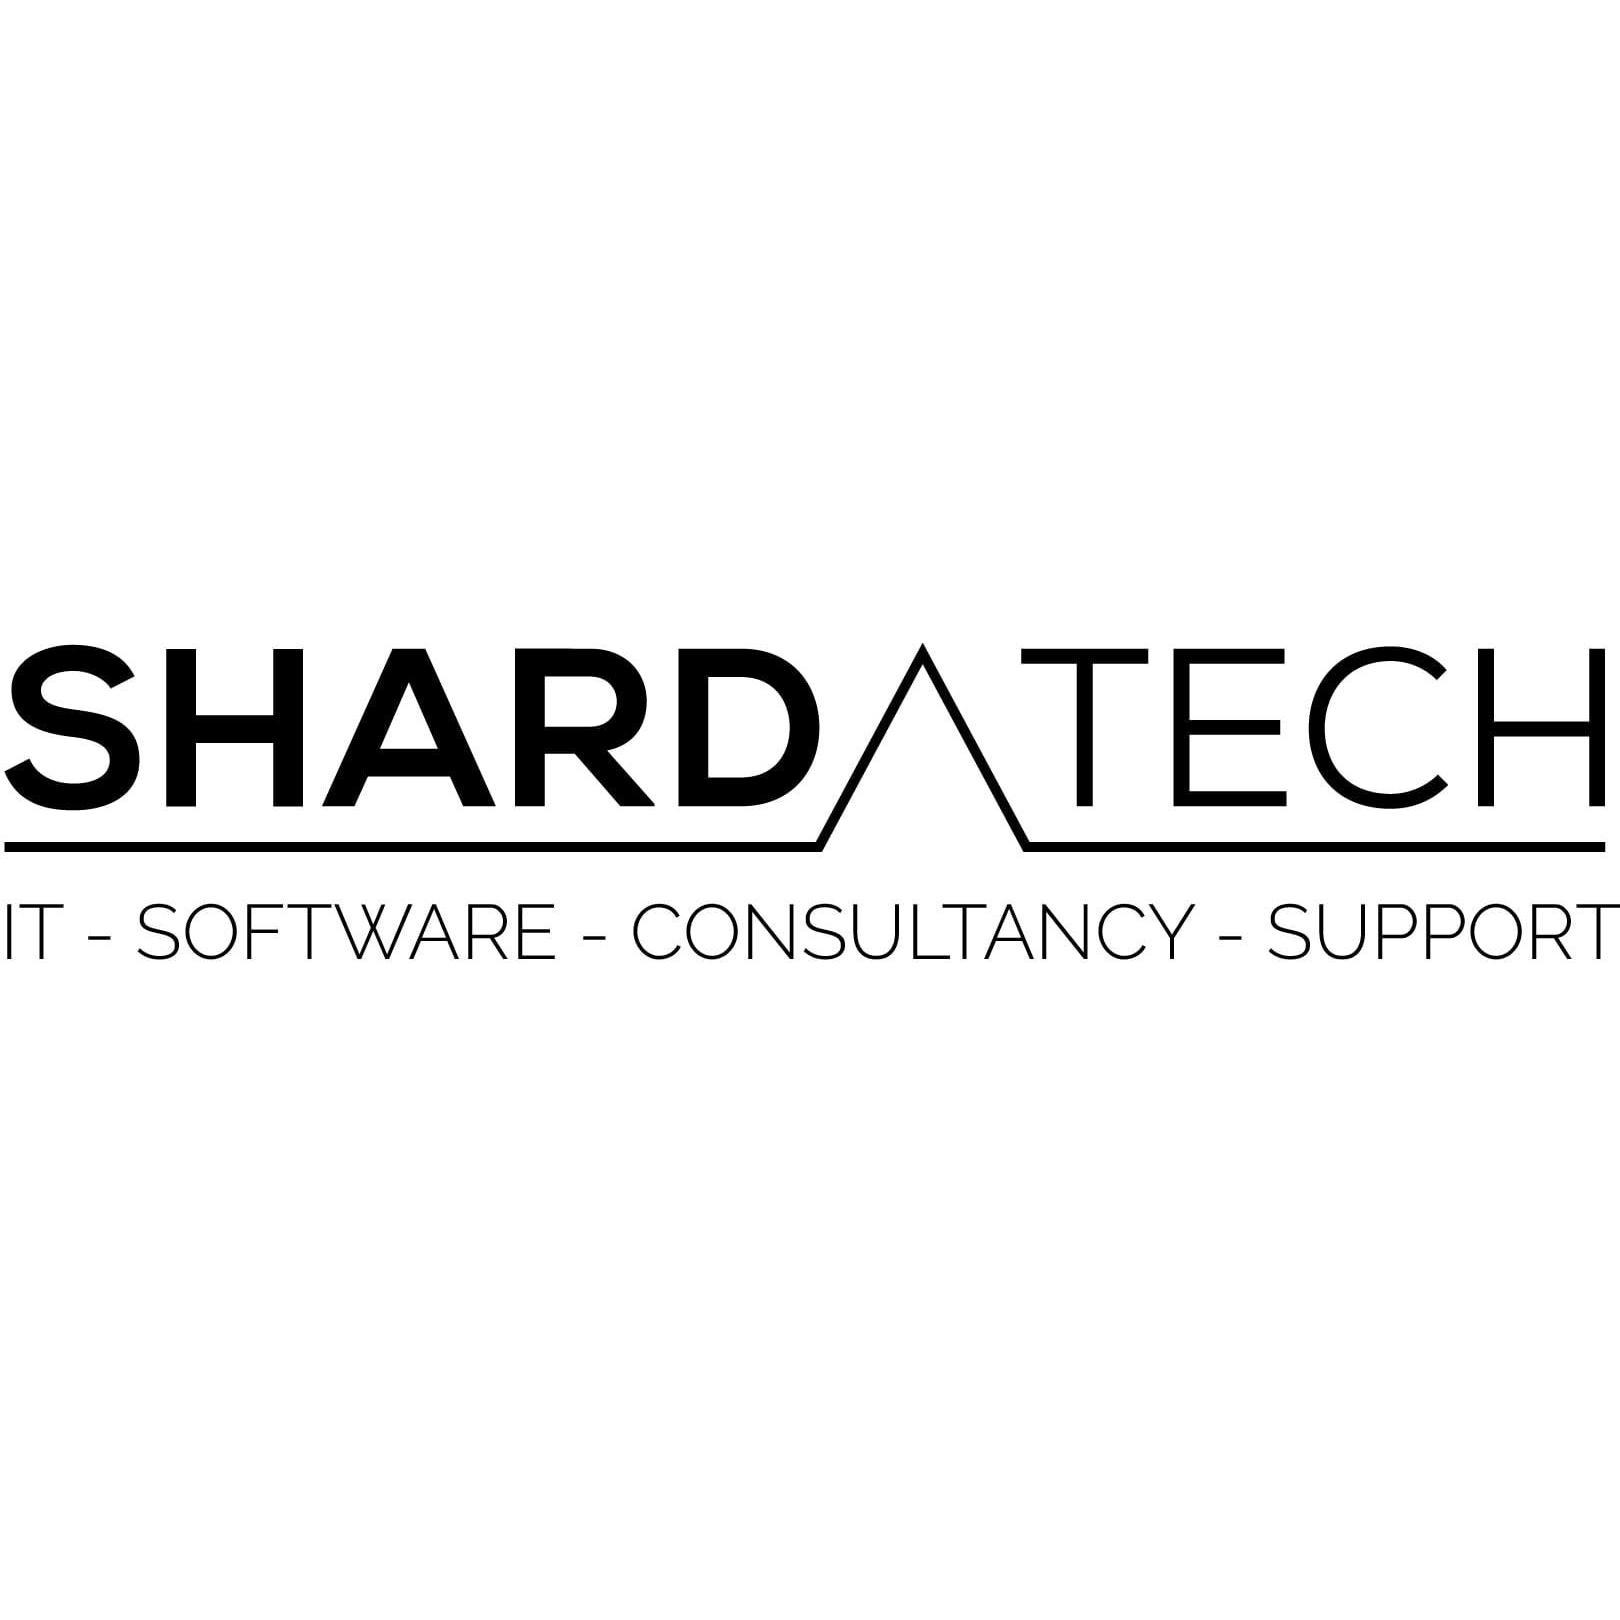 Shard Tech Ltd - Aylesbury, Buckinghamshire HP18 0HR - 03333 580033 | ShowMeLocal.com